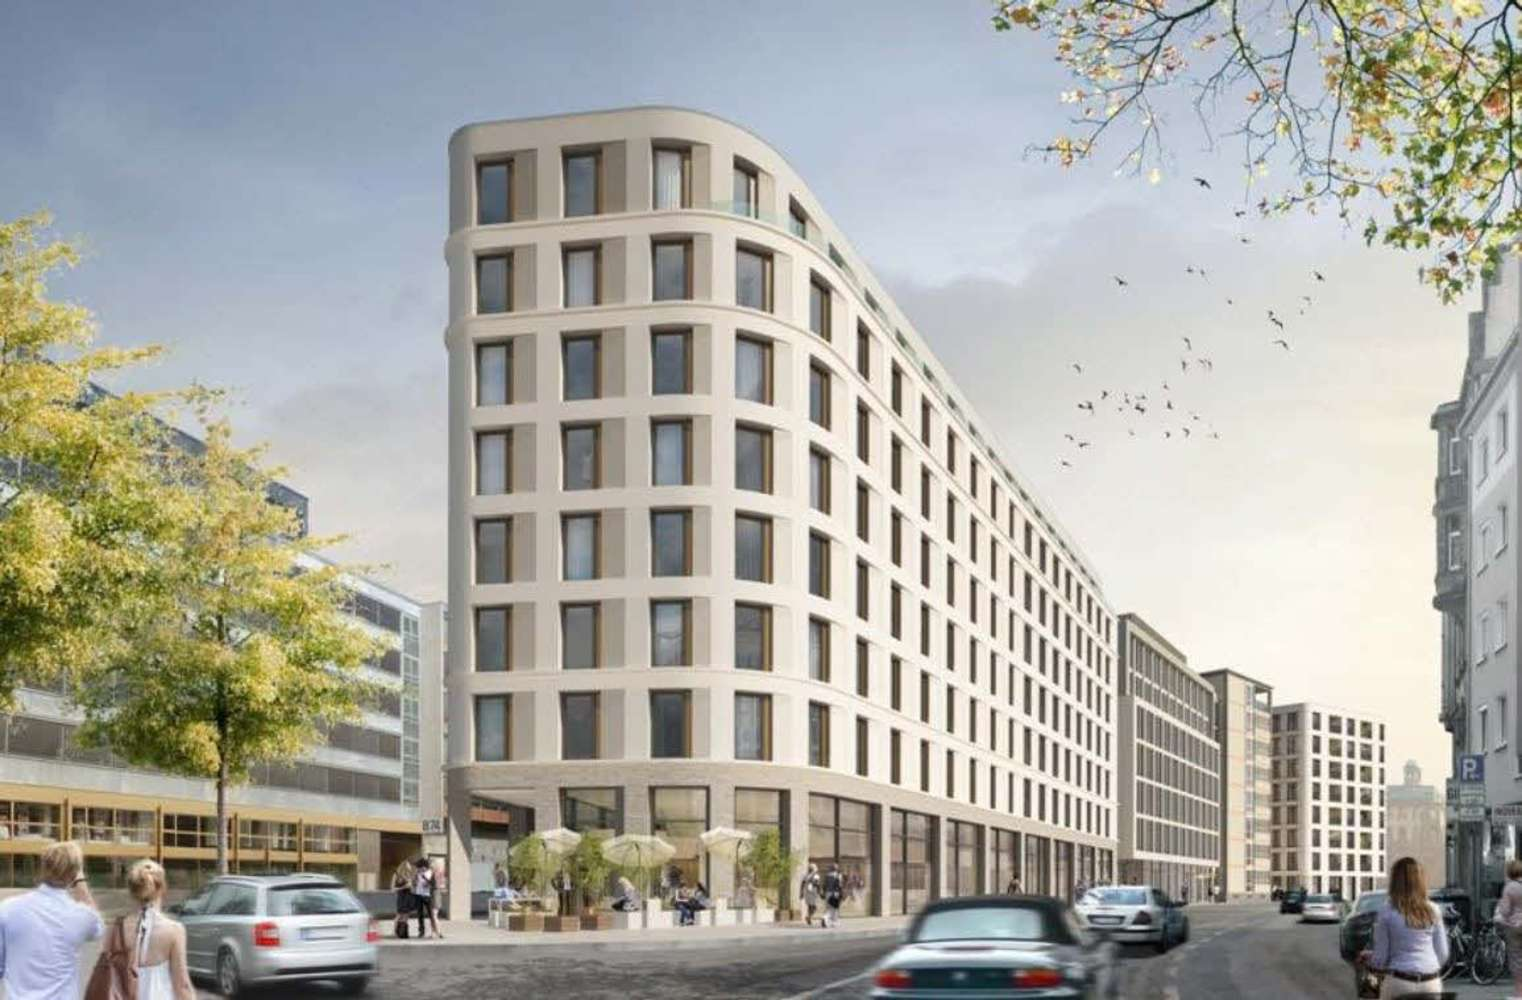 Büros Frankfurt am main, 60311 - Büro - Frankfurt am Main, Altstadt - F2244 - 9428313